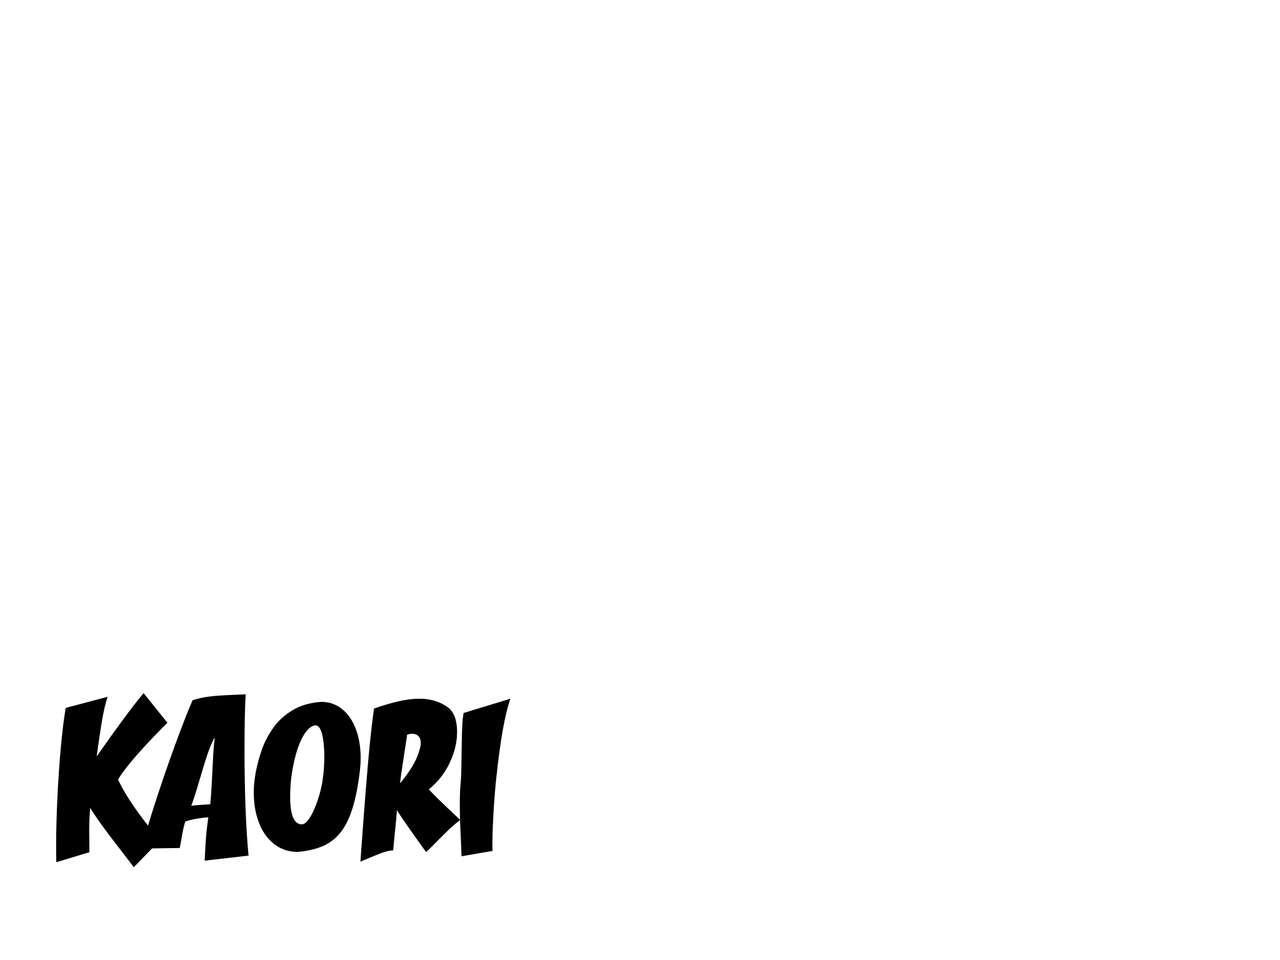 [Mikezoutei] Netorare Haha ~Kachiki de Kimottama no Okaa-san ga Boku o Ijimeru Aitsu no Onna ni Naru Hanashi~   Mom NTR ~A Story Of How My Gutsy Mom Ended Up Becoming My Bully's Plaything~ [English] {Doujins.com} 33